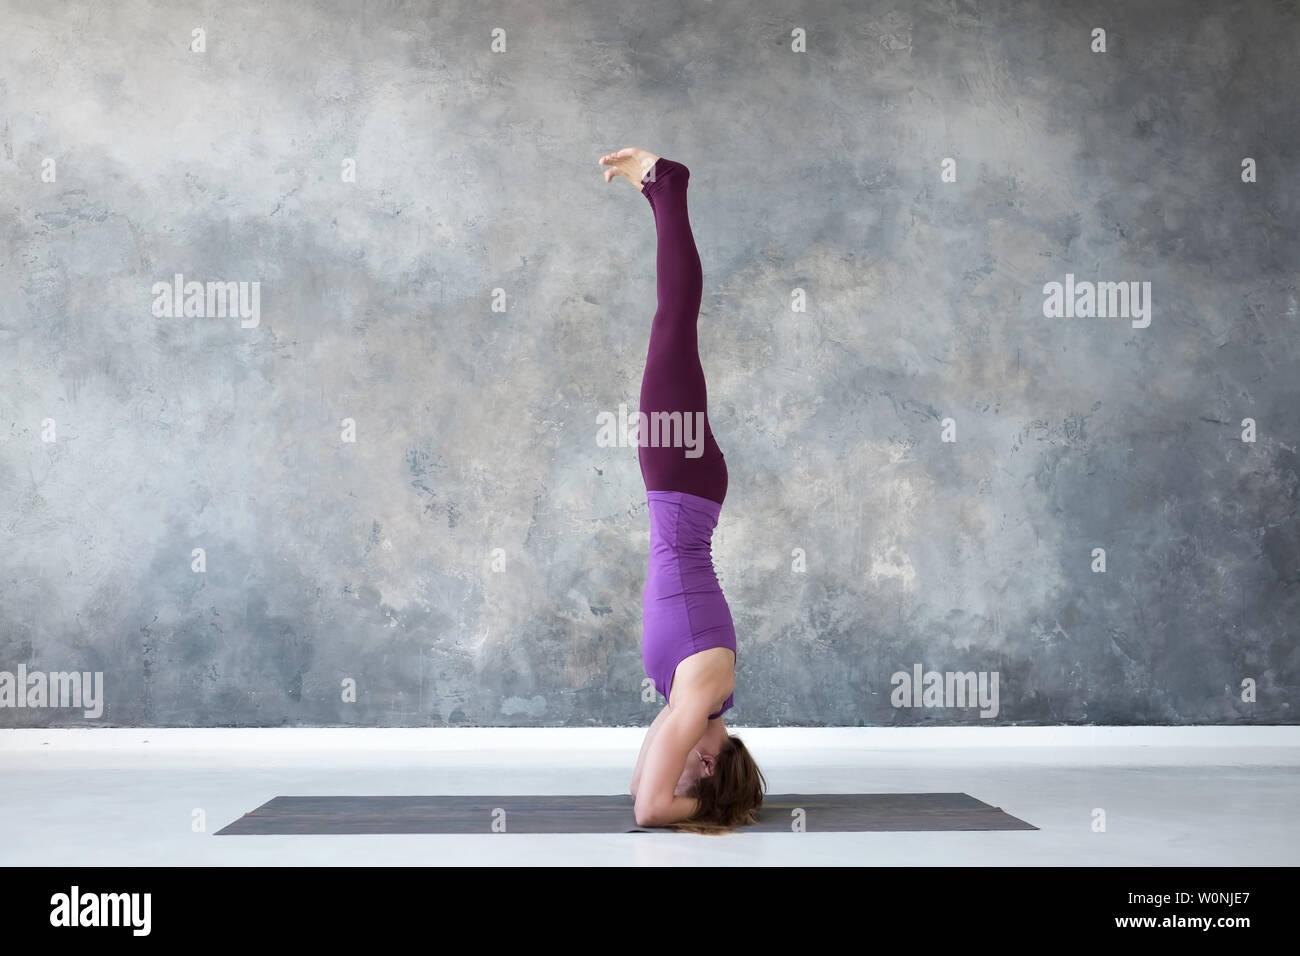 woman practicing yoga, standing in salamba sirsasana exercise, headstand pose - Stock Image